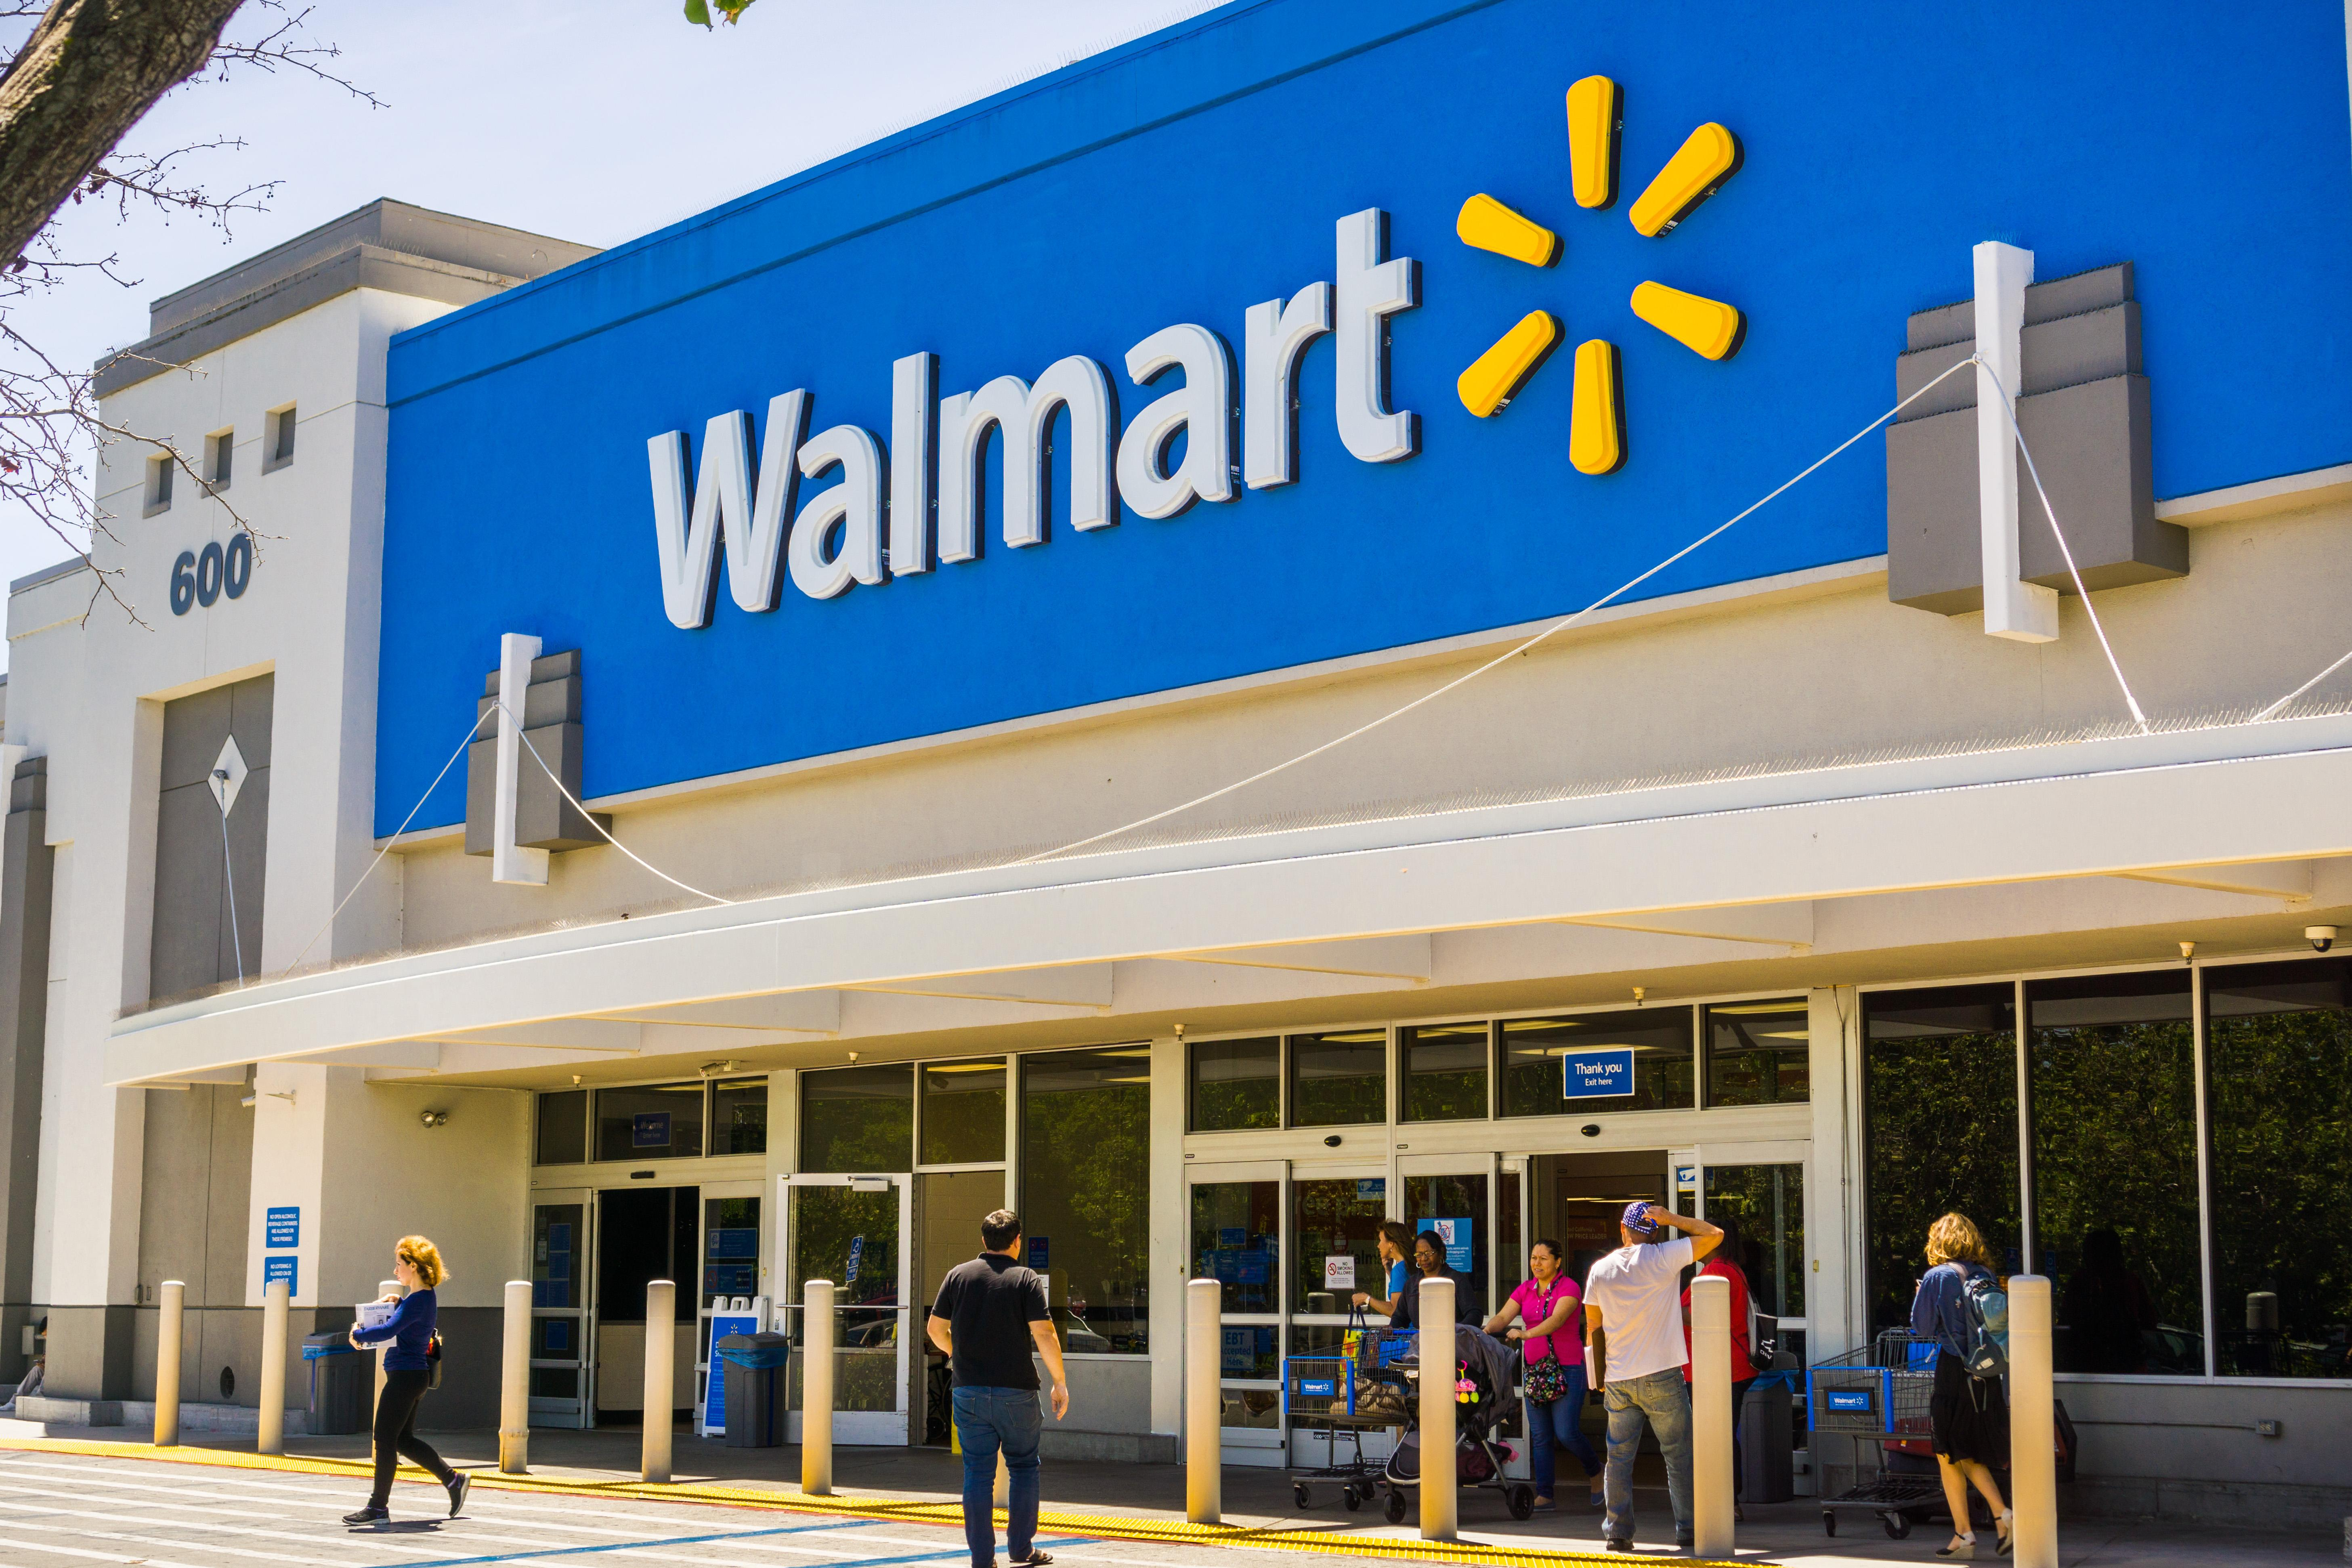 Walmart asks stores to remove violent video game signage